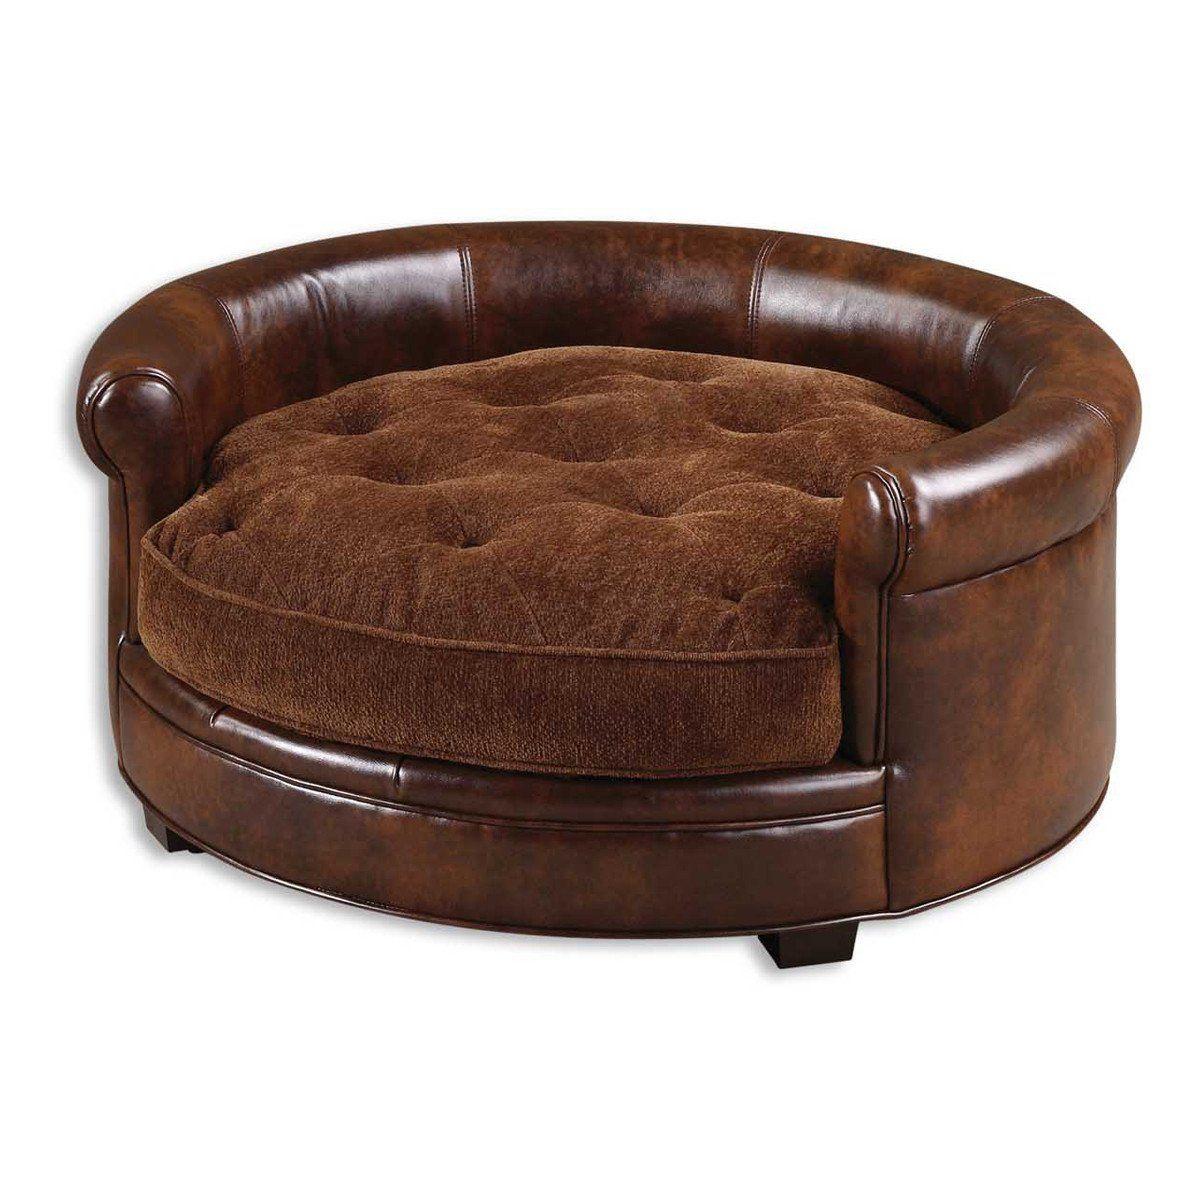 Lucky Designer Pet Bed Designer Pet Beds Dog Pet Beds Pet Furniture